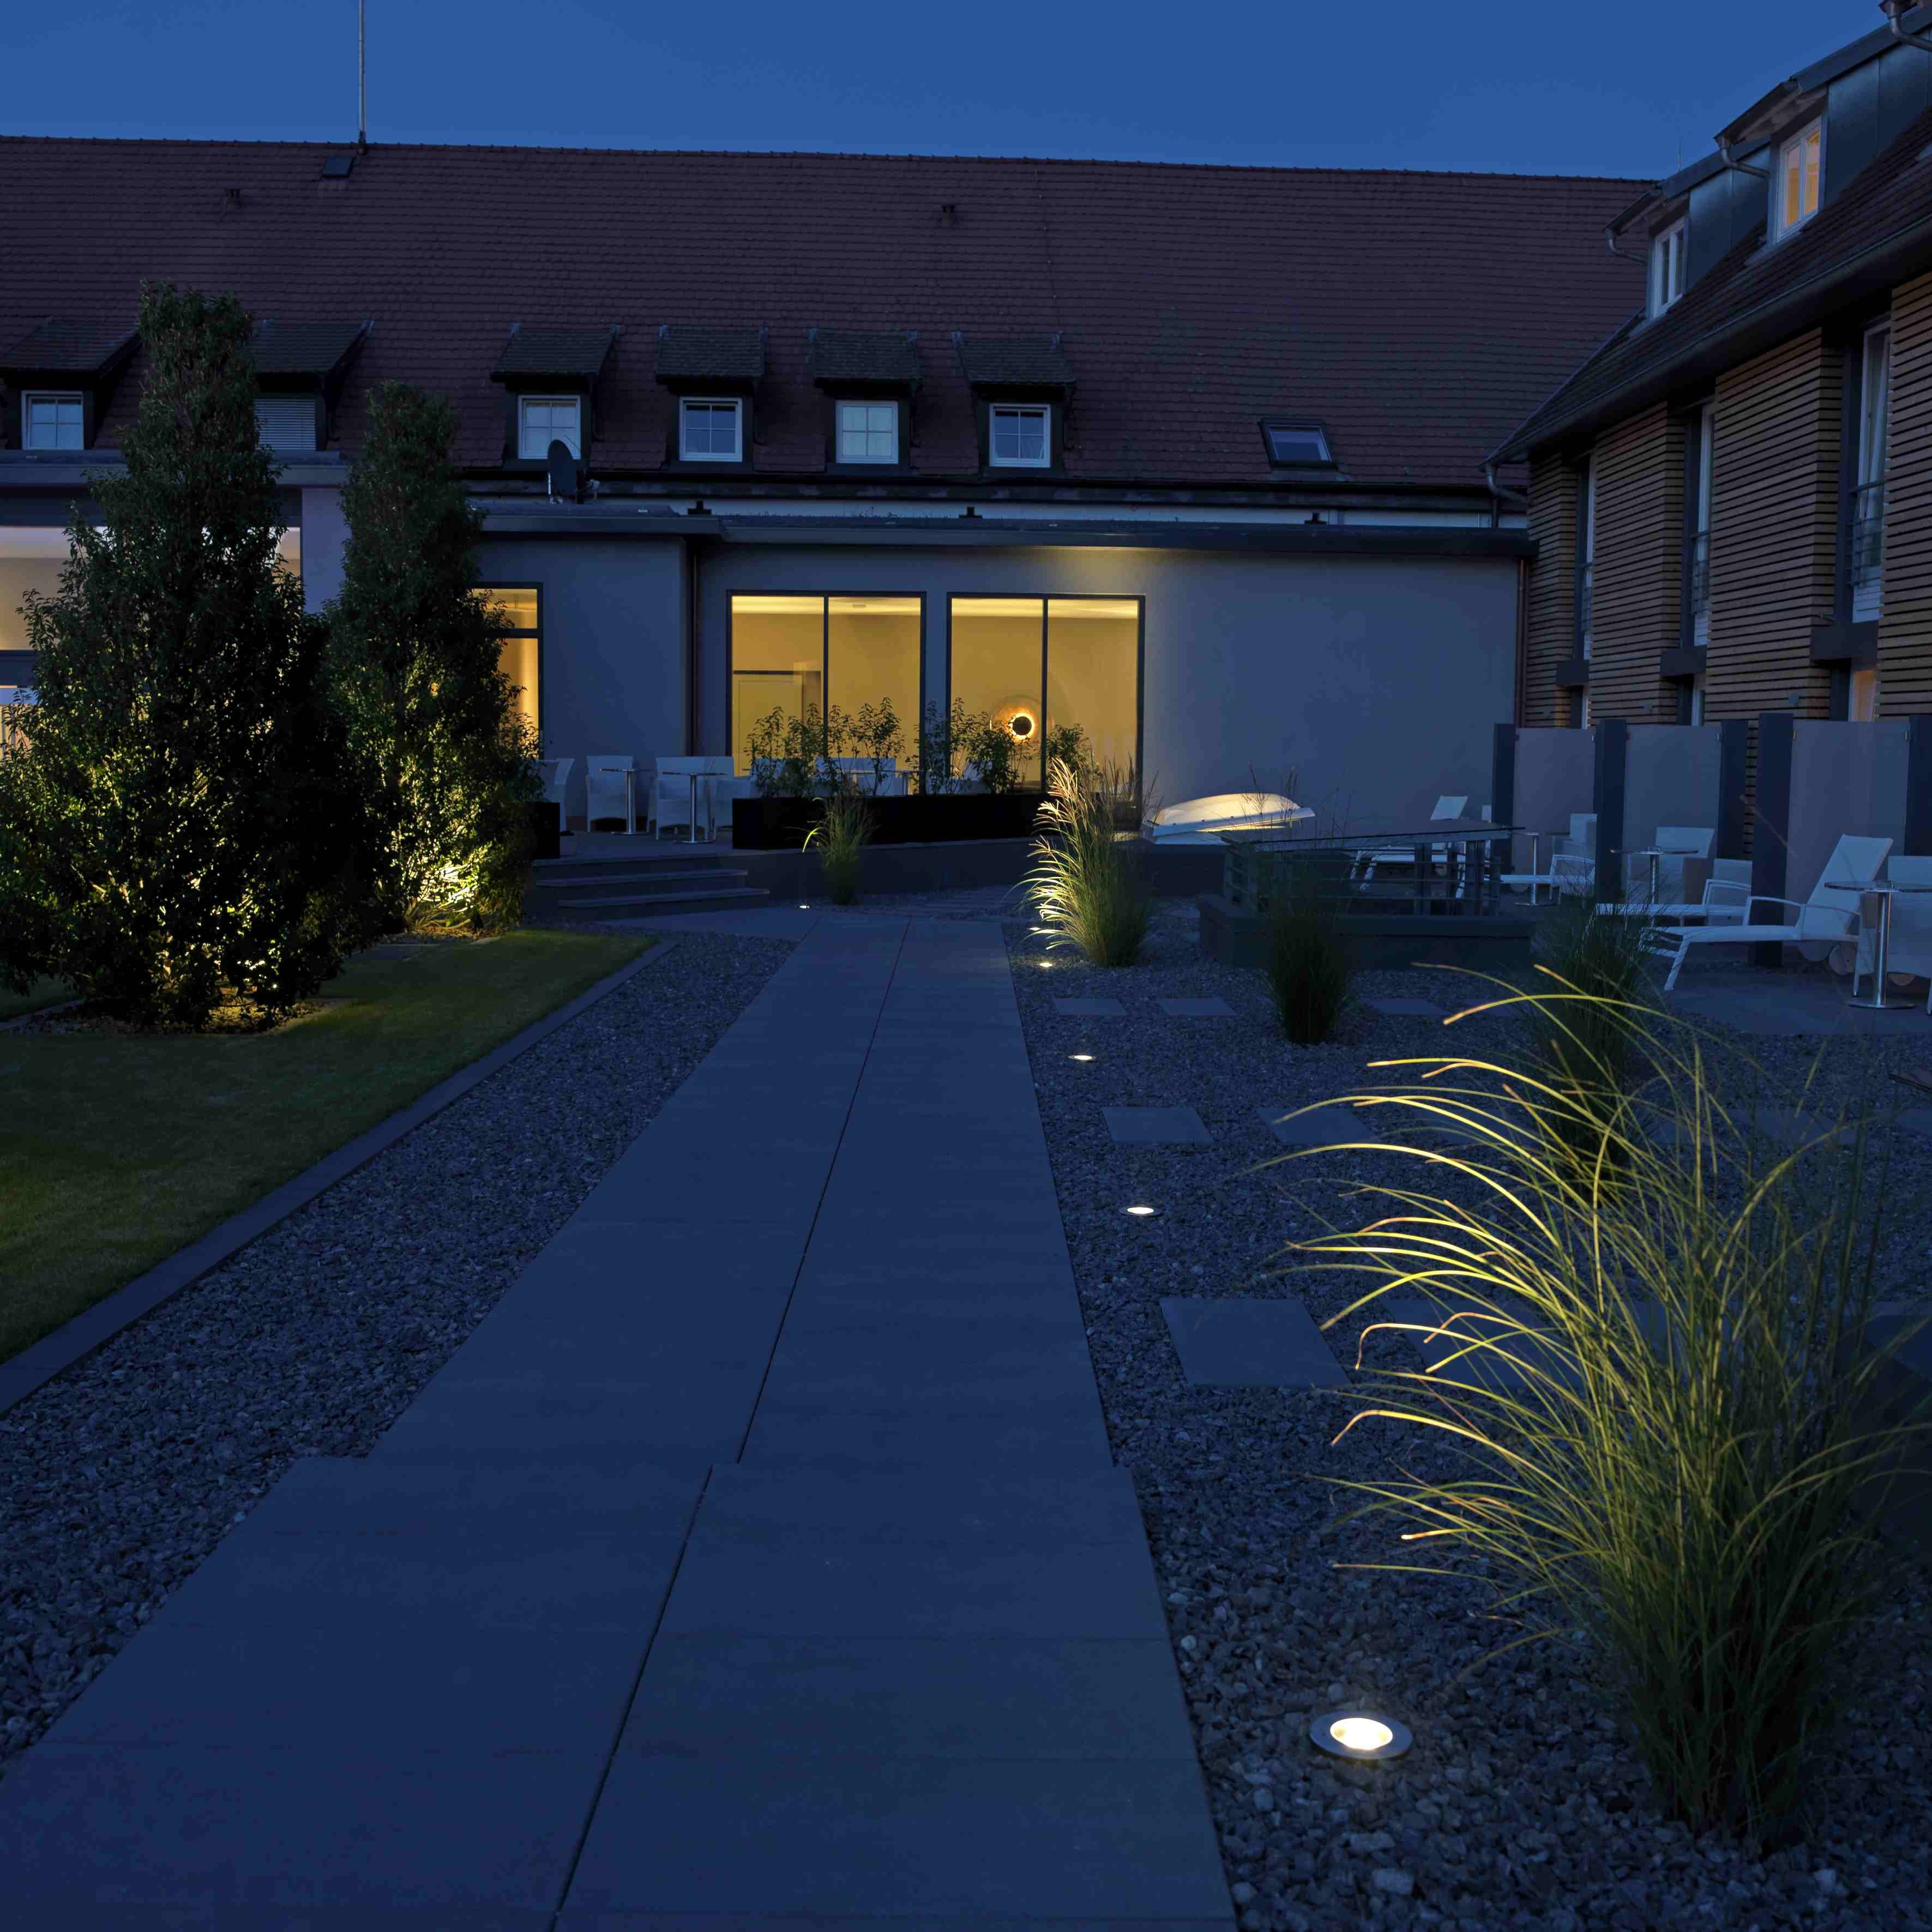 692316 Albert Leuchten LED Erdeinbaustrahler Bodeneinbauleuchten ...